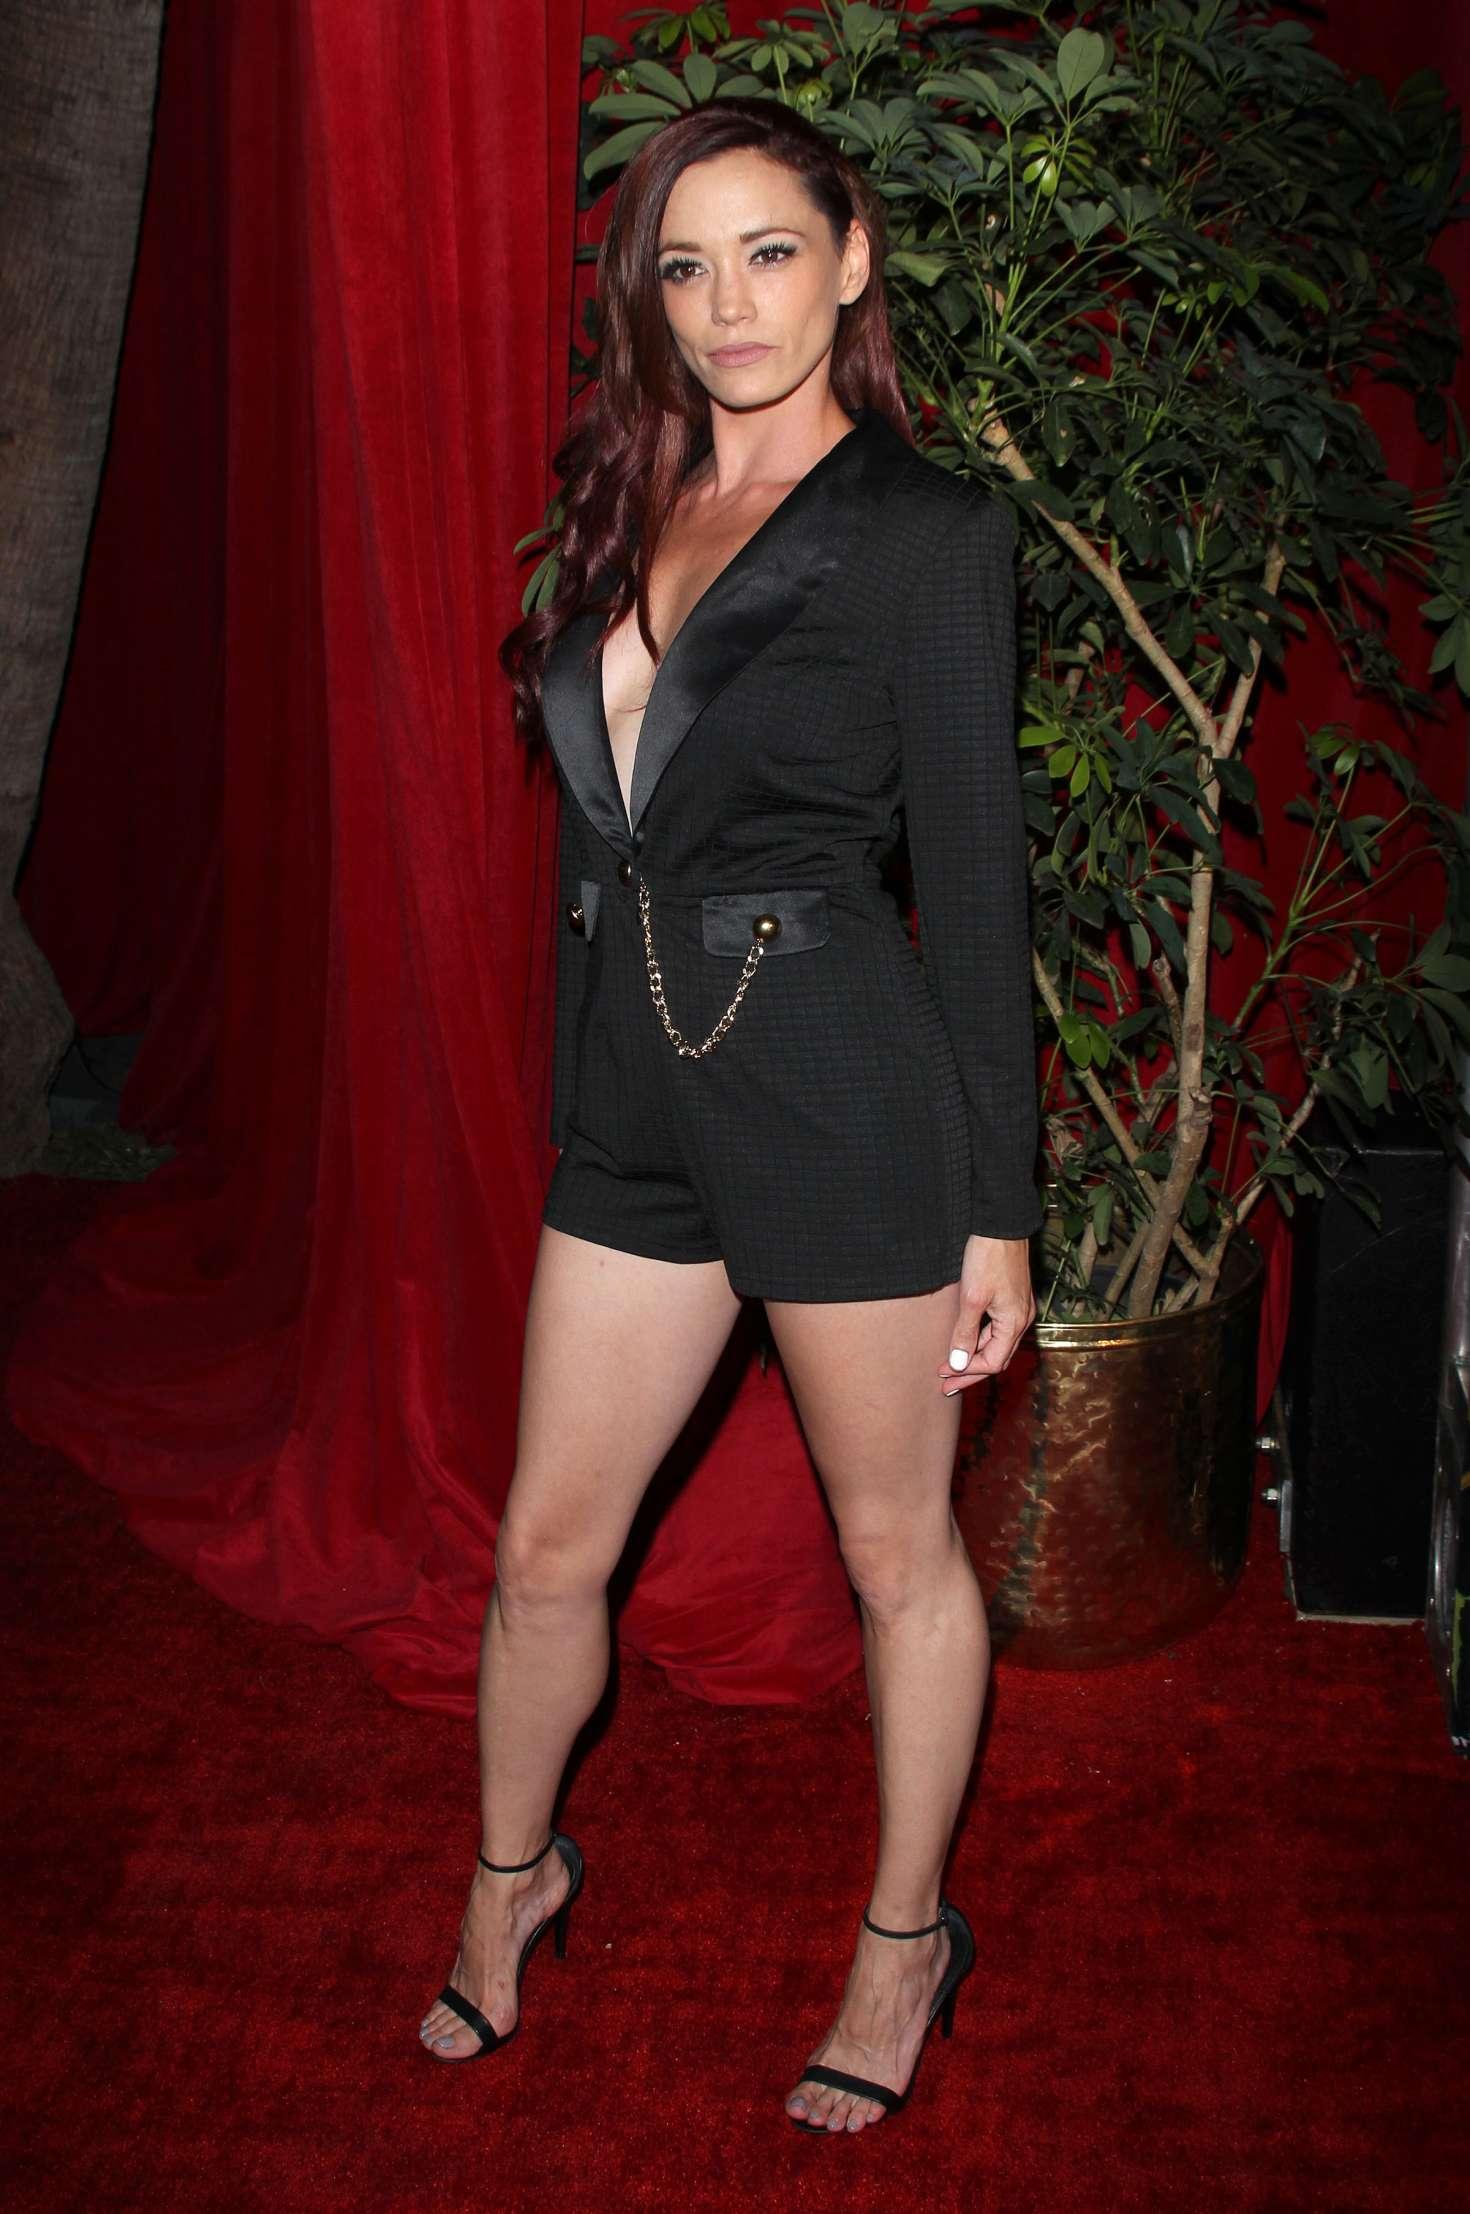 Photos Jessica Sutta nude (27 photos), Sexy, Hot, Instagram, lingerie 2020